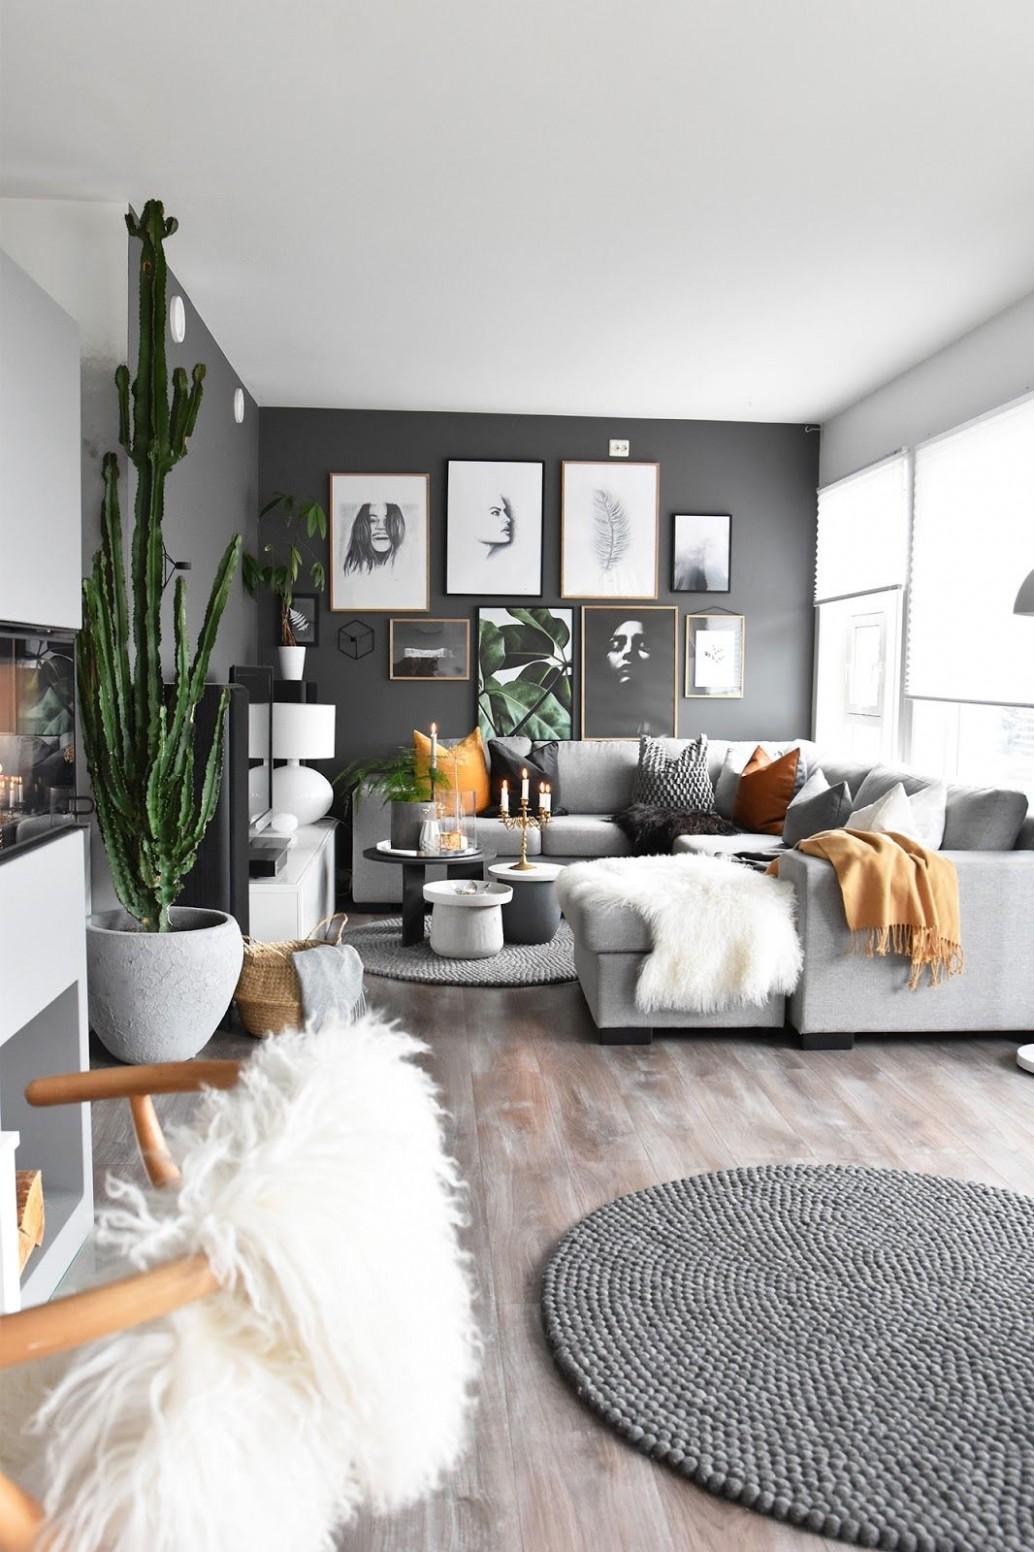 Pinterest // @JusLiv  College apartment decor, Apartment  - Apartment Room Ideas Pinterest